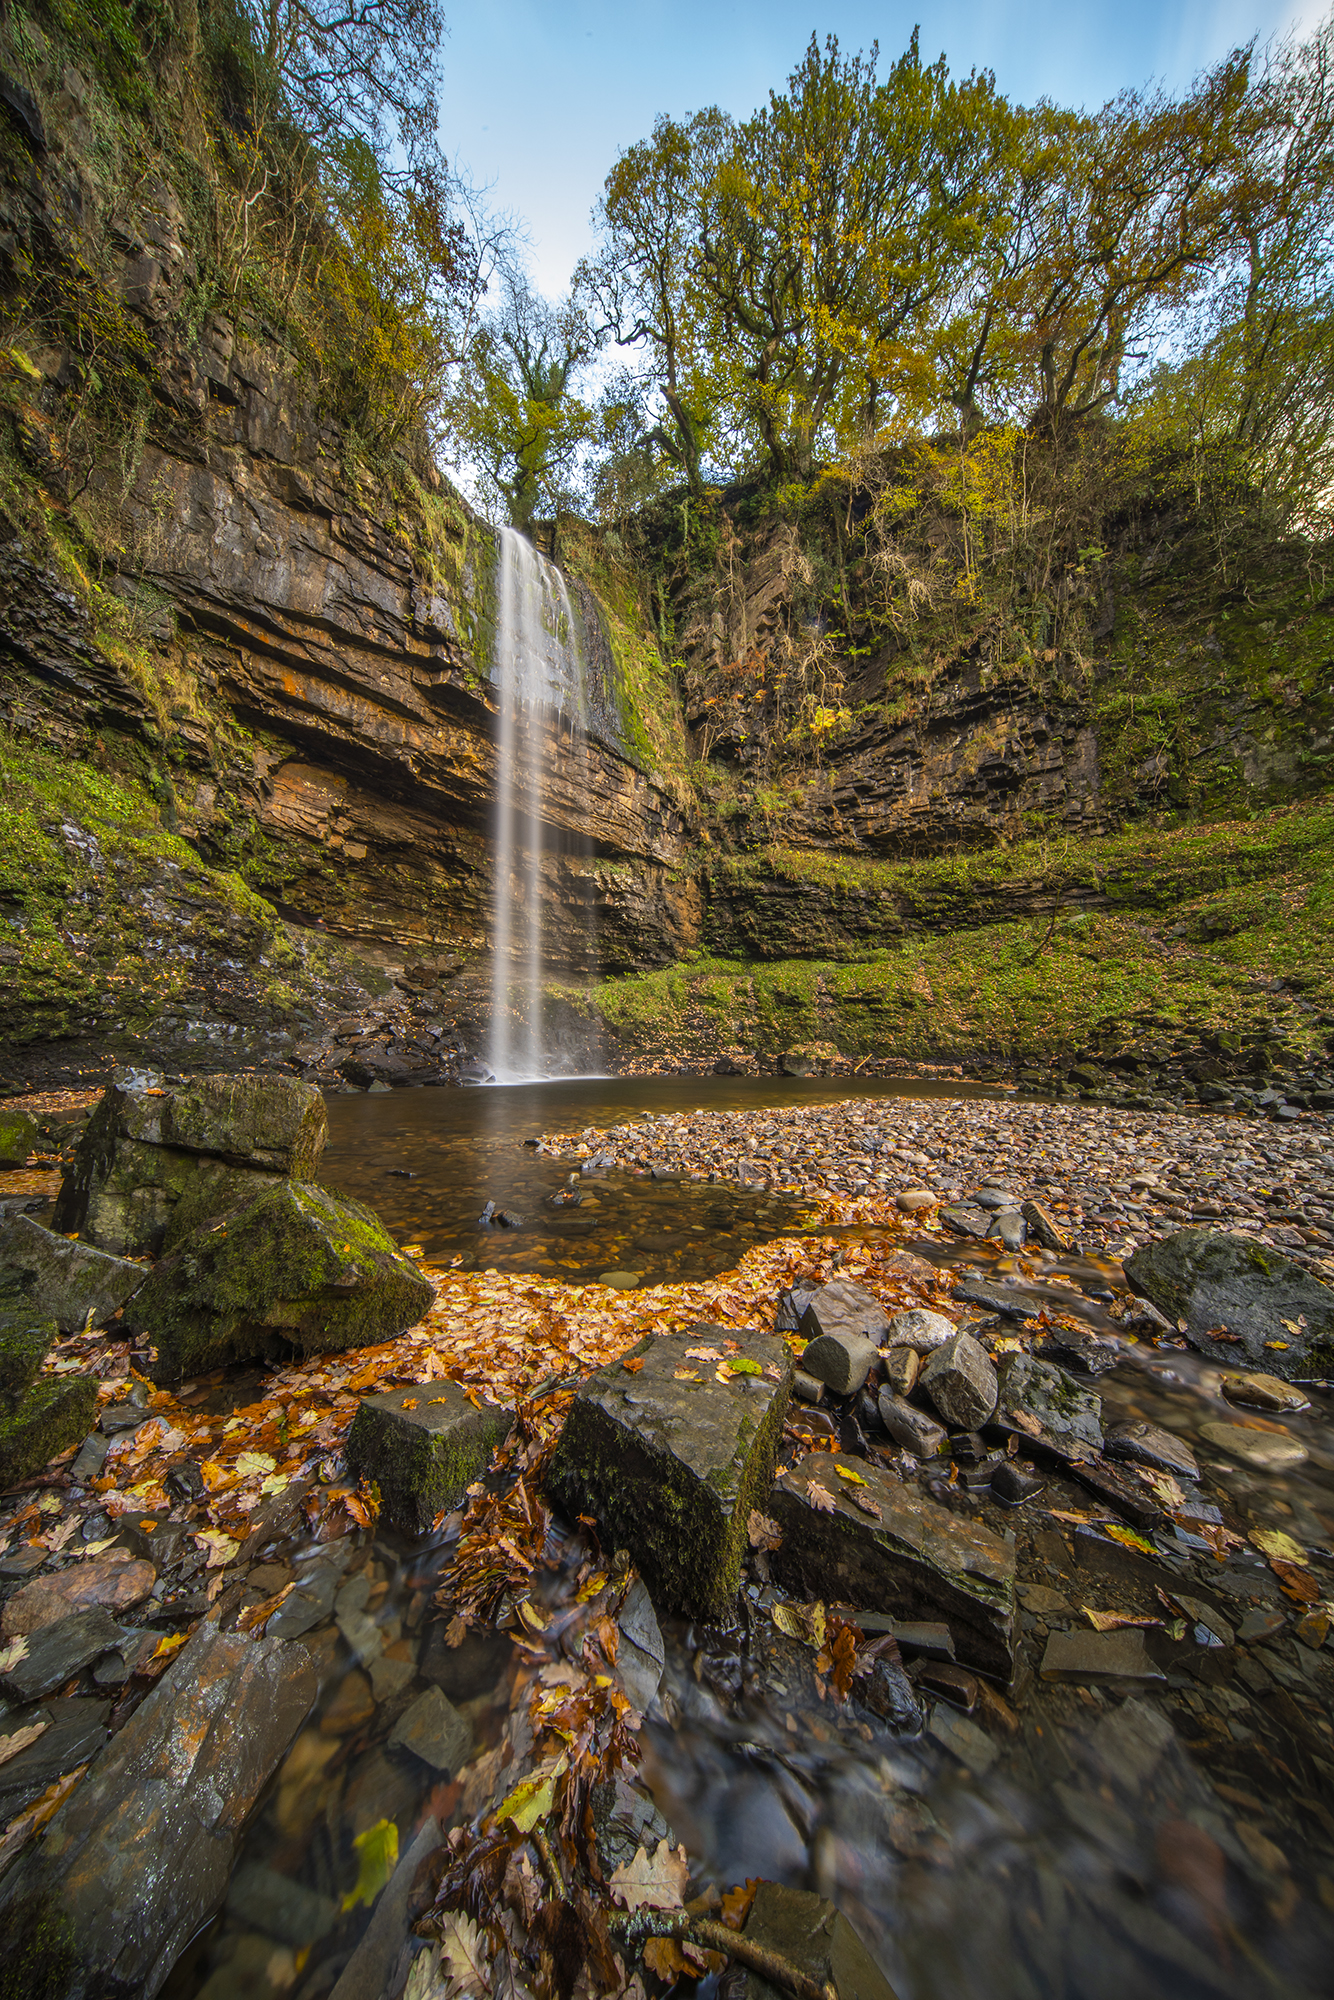 waterfall - f22.jpg